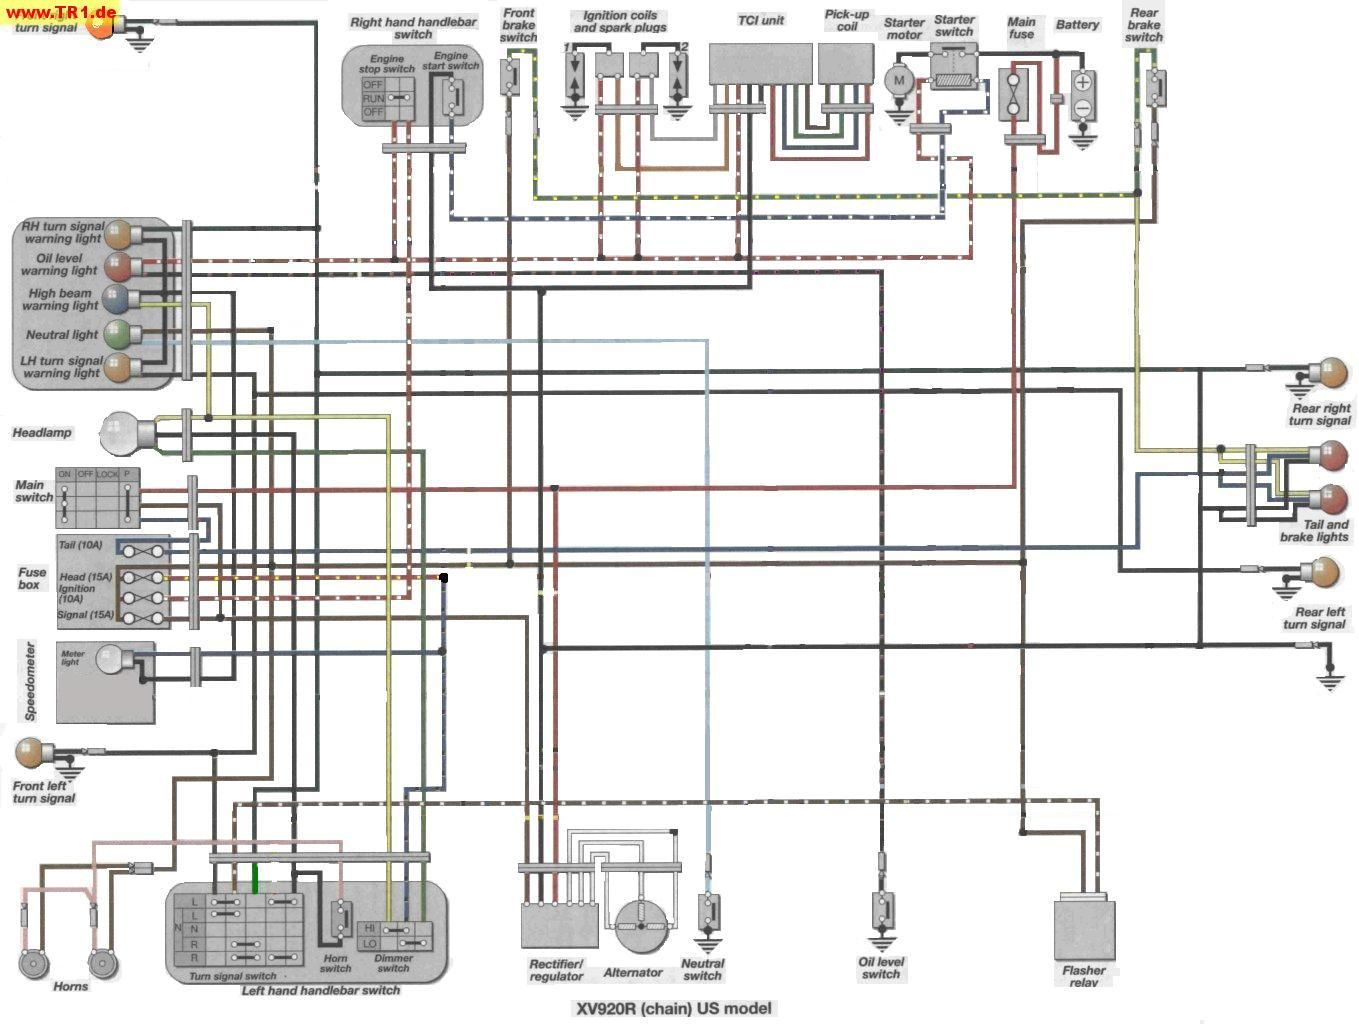 xv920 wiring diagram wiring diagram weektr1 xv1000 xv920 wiring diagrams manfred u0027s tr1 page all [ 1359 x 1024 Pixel ]